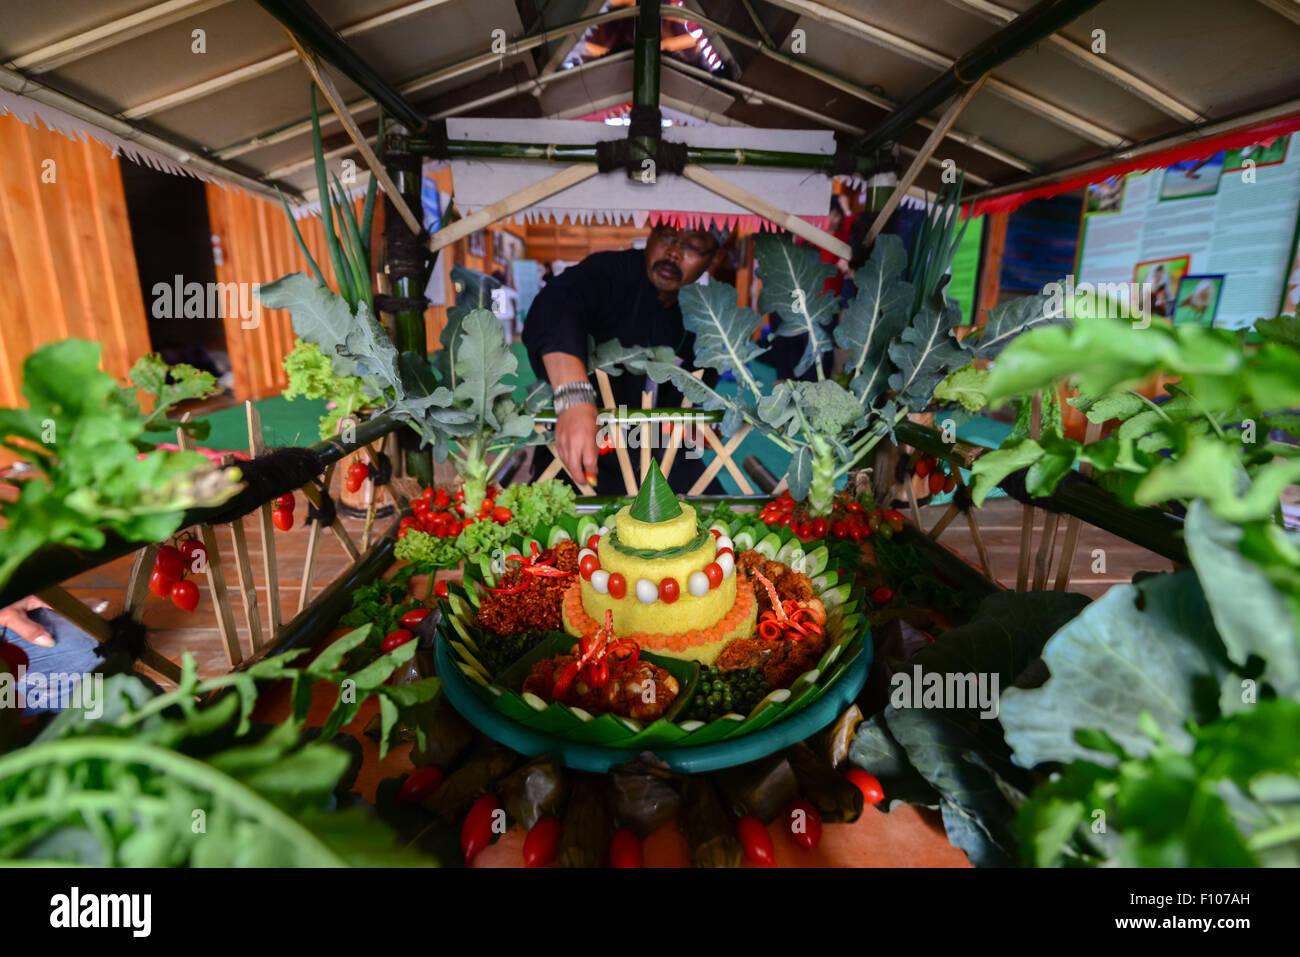 Elder of traditional Sundanese community prepares food offering for ceremony. - Stock Image